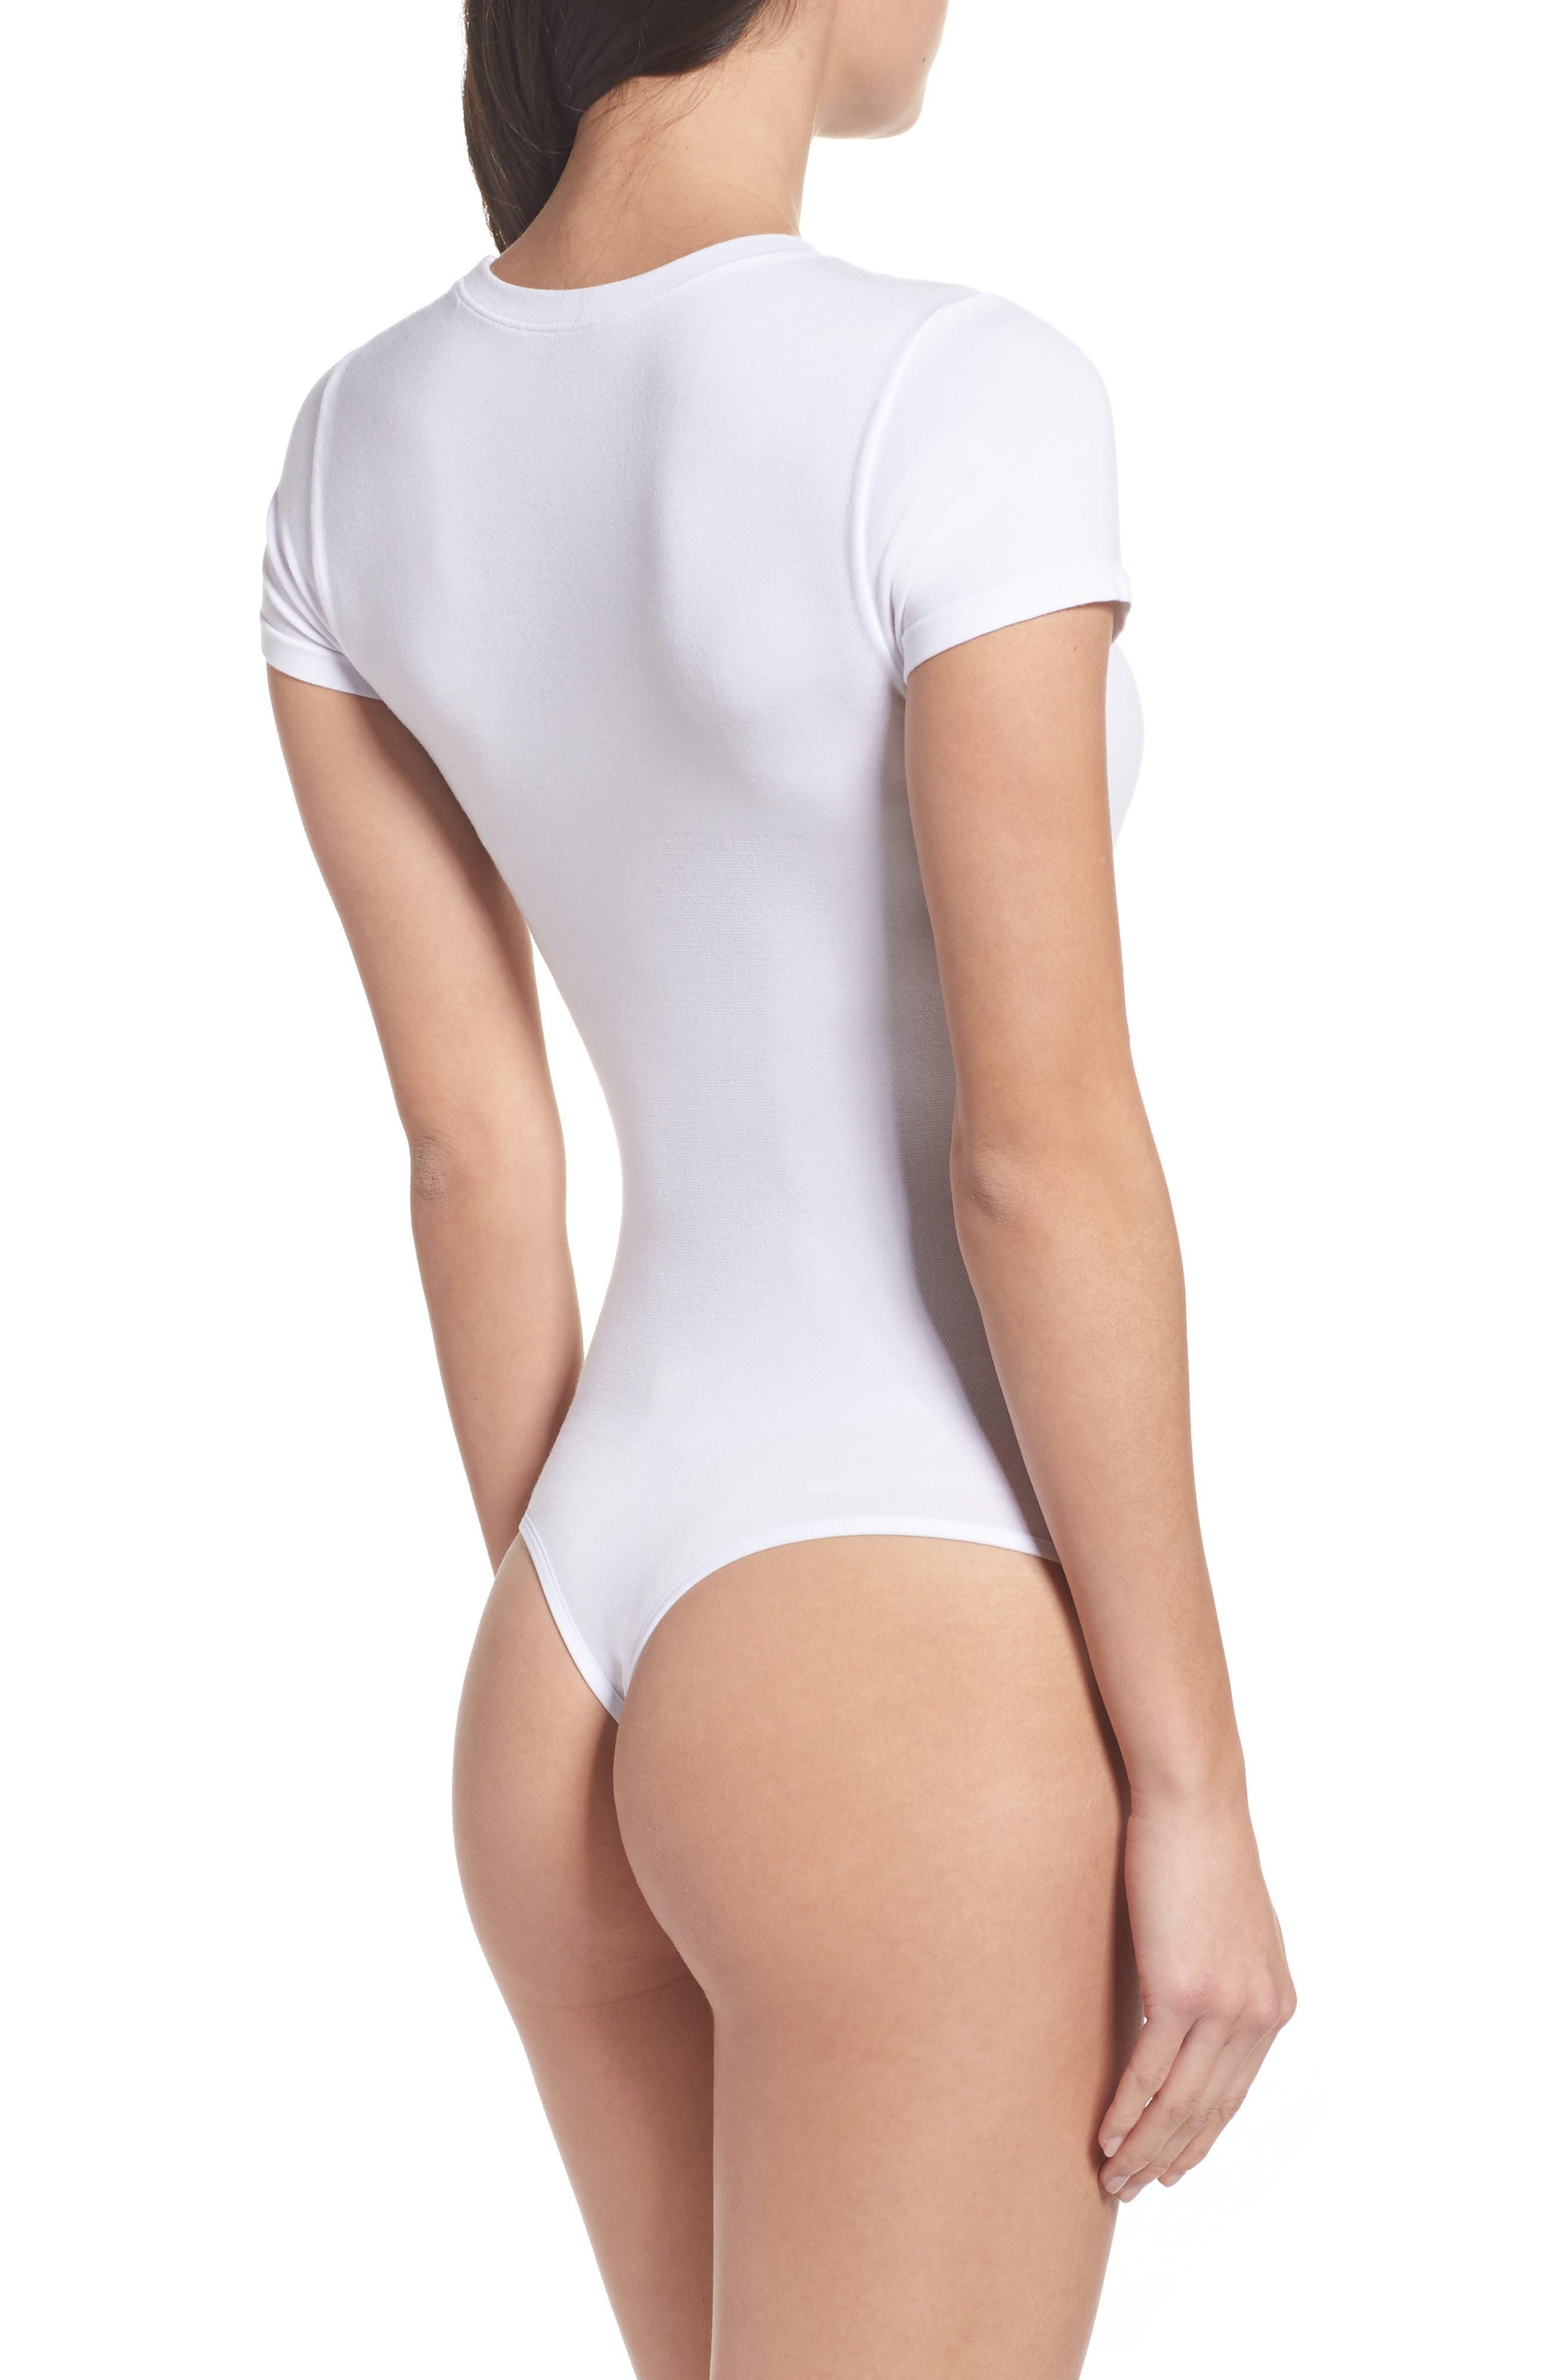 Thong Bodysuit,                             Alternate thumbnail 2, color,                             White